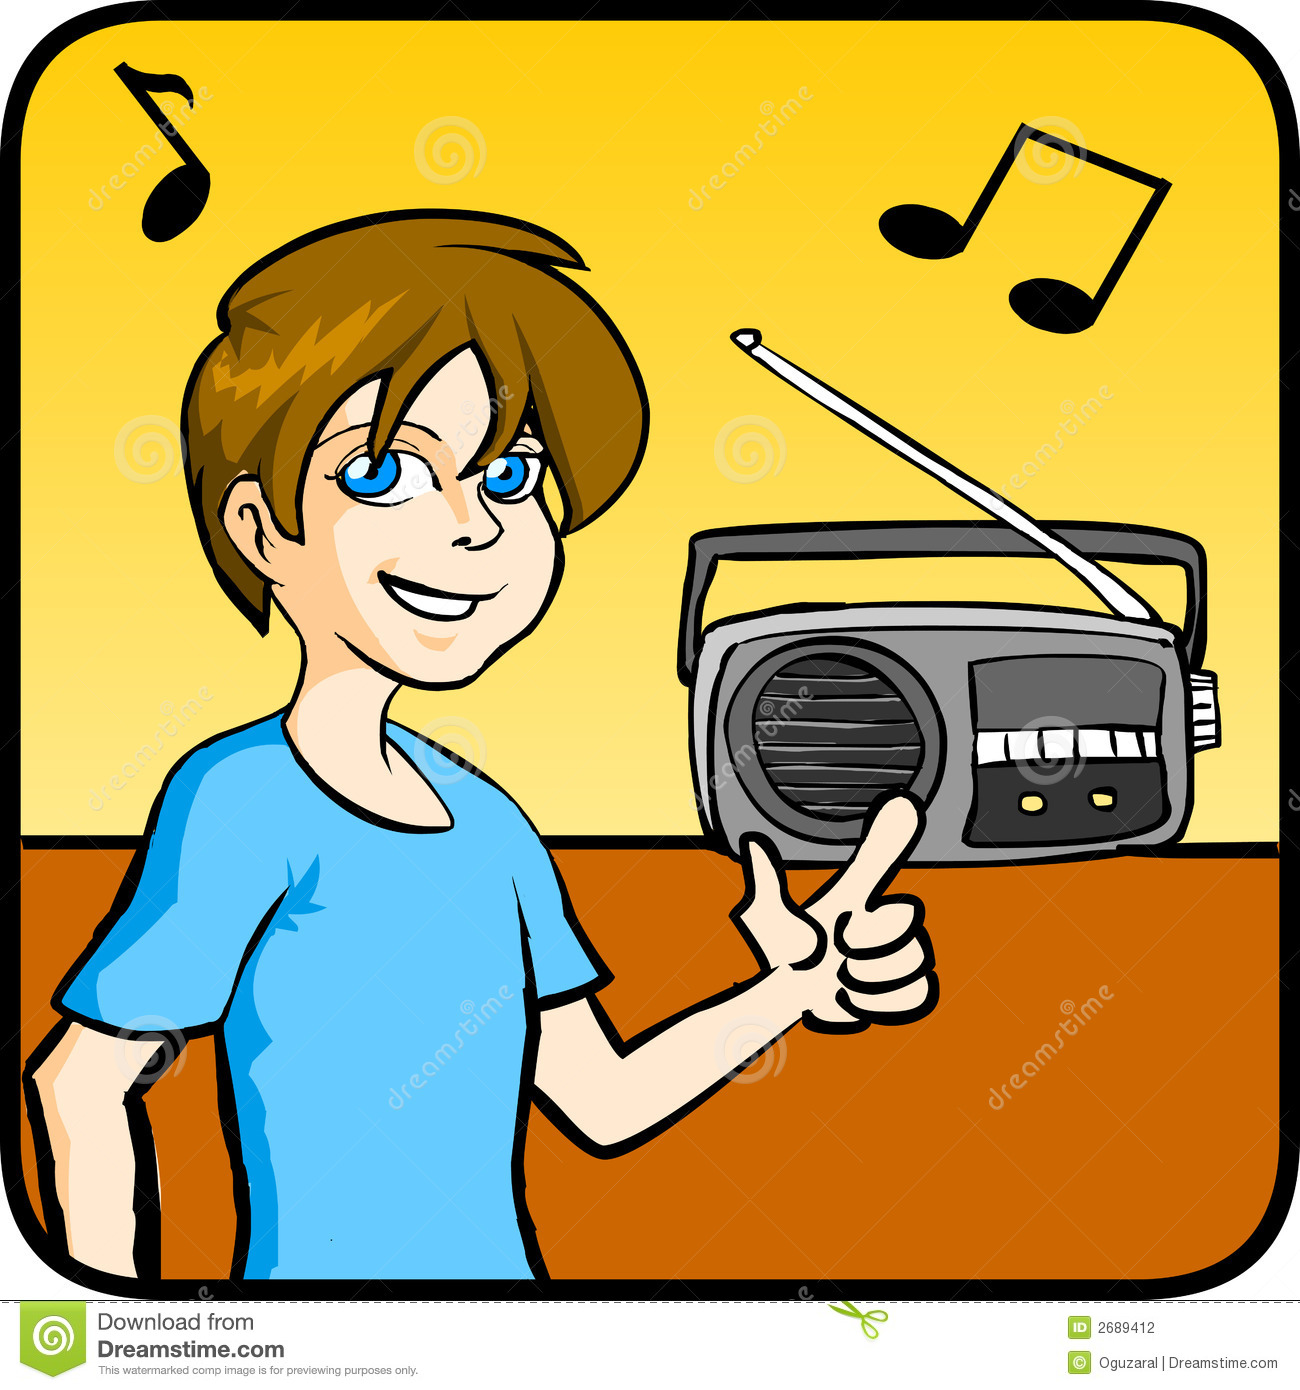 boy listening to music clipart clipart panda free clipart images rh clipartpanda com